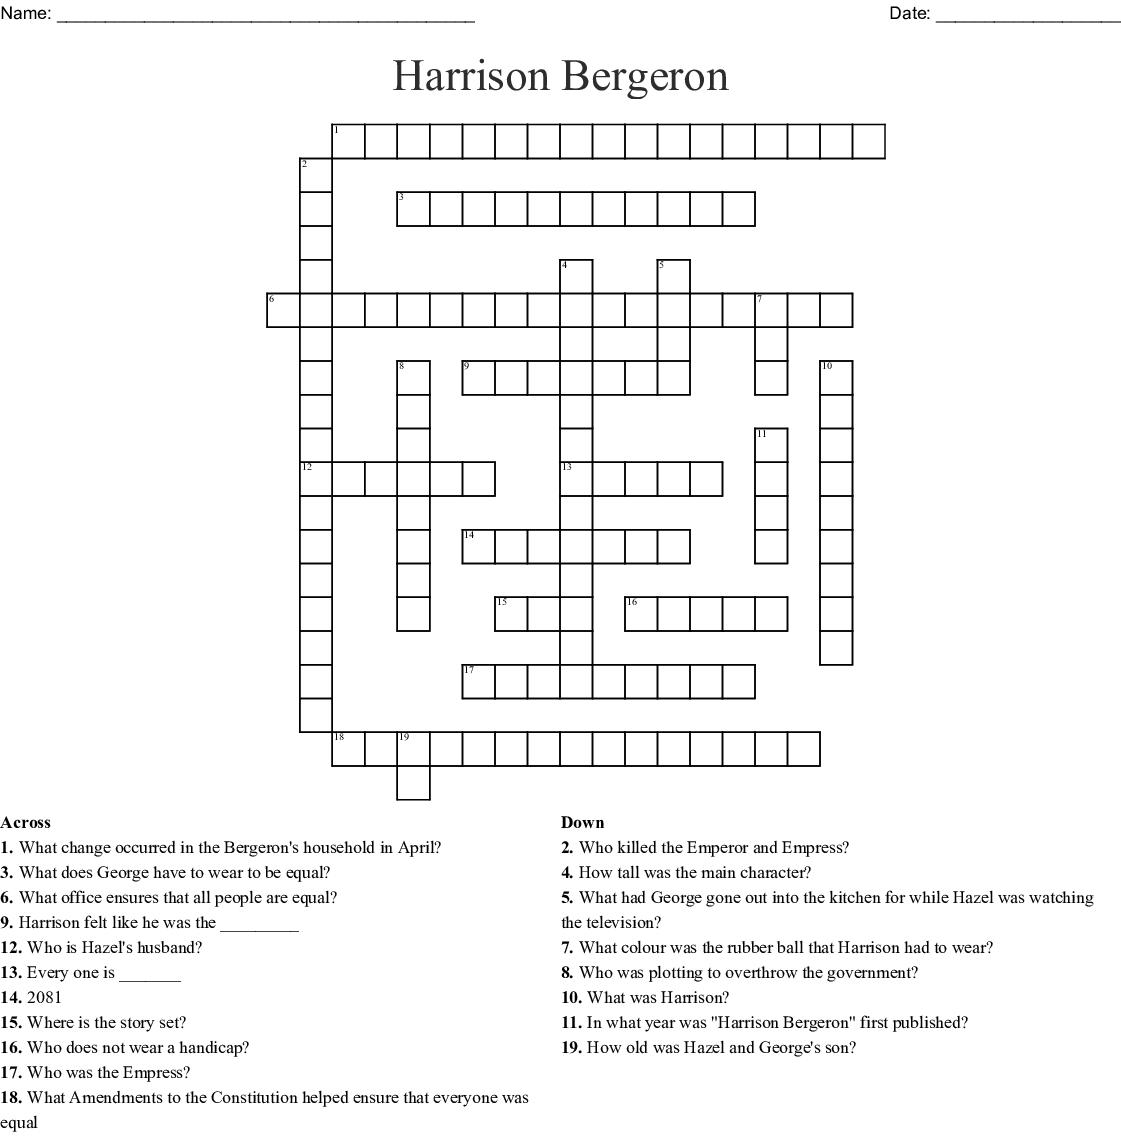 Harrison Bergeron Crossword